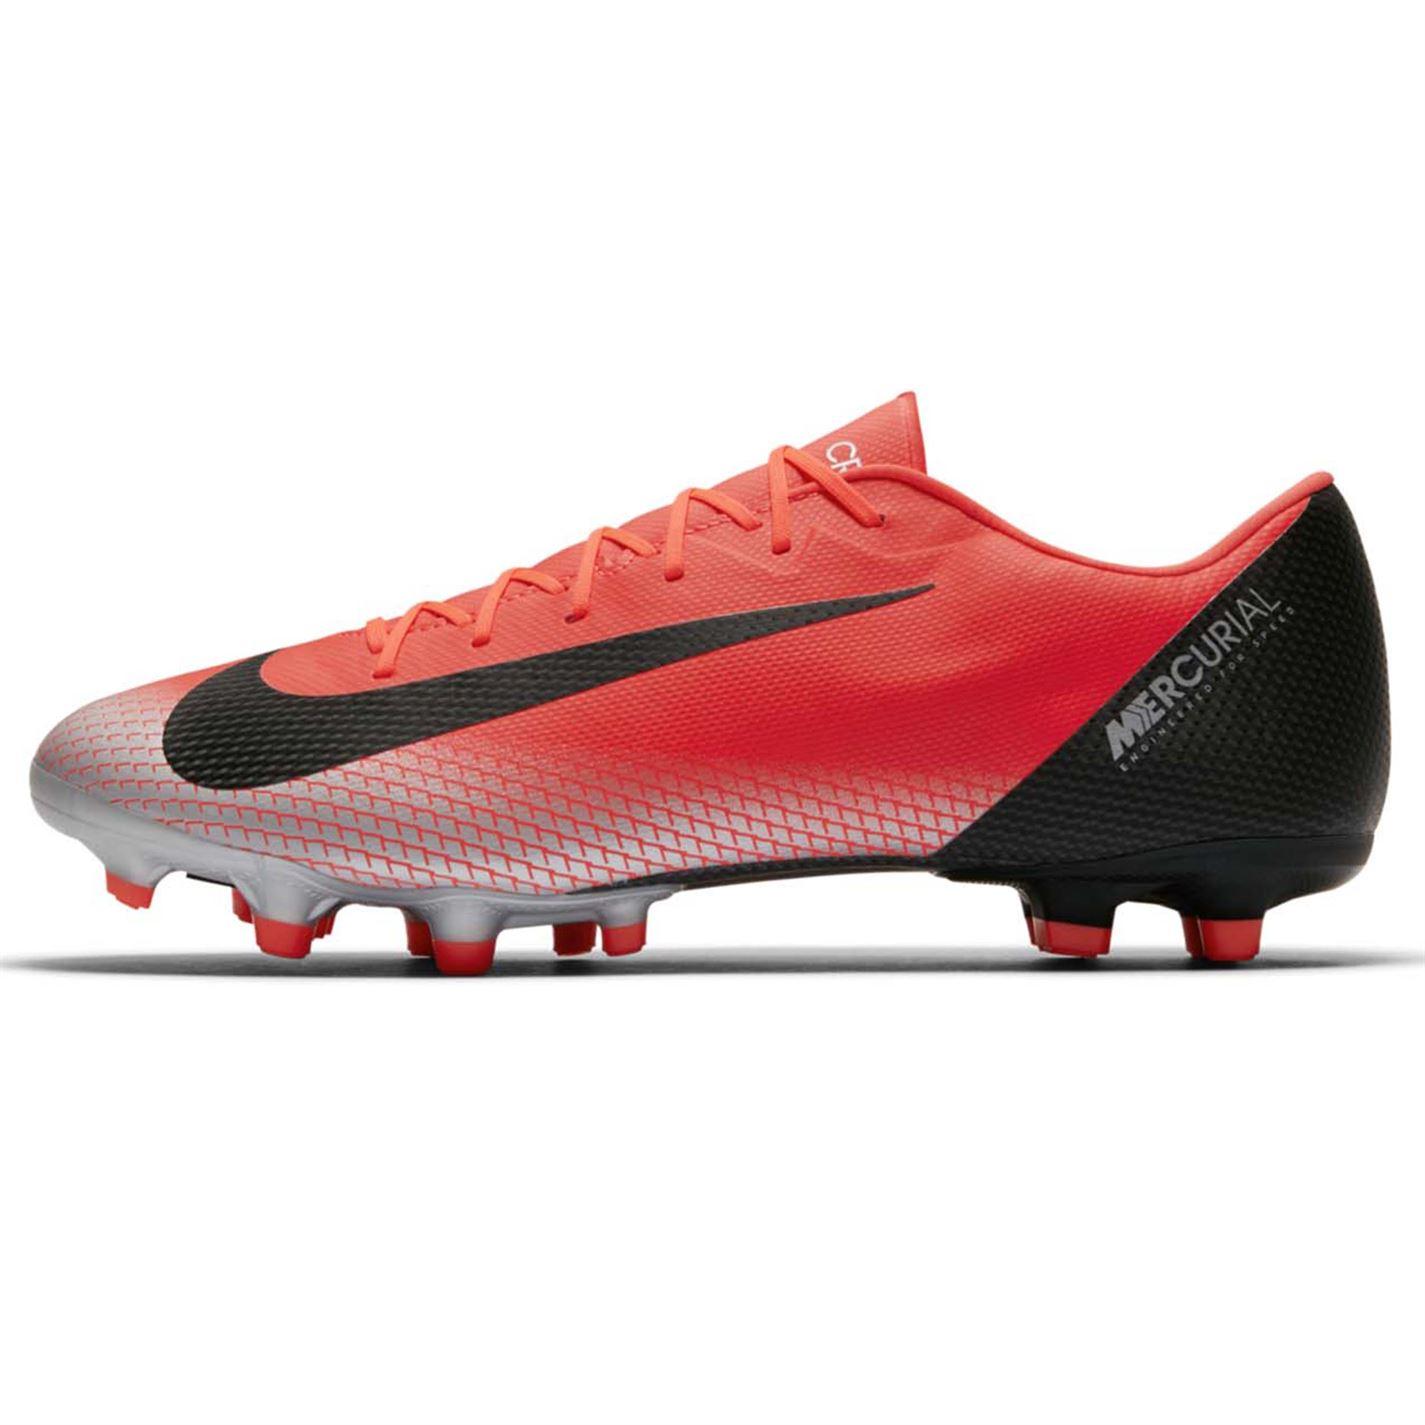 kopačky Nike Mercurial Vapor Academy CR7 pánské FG